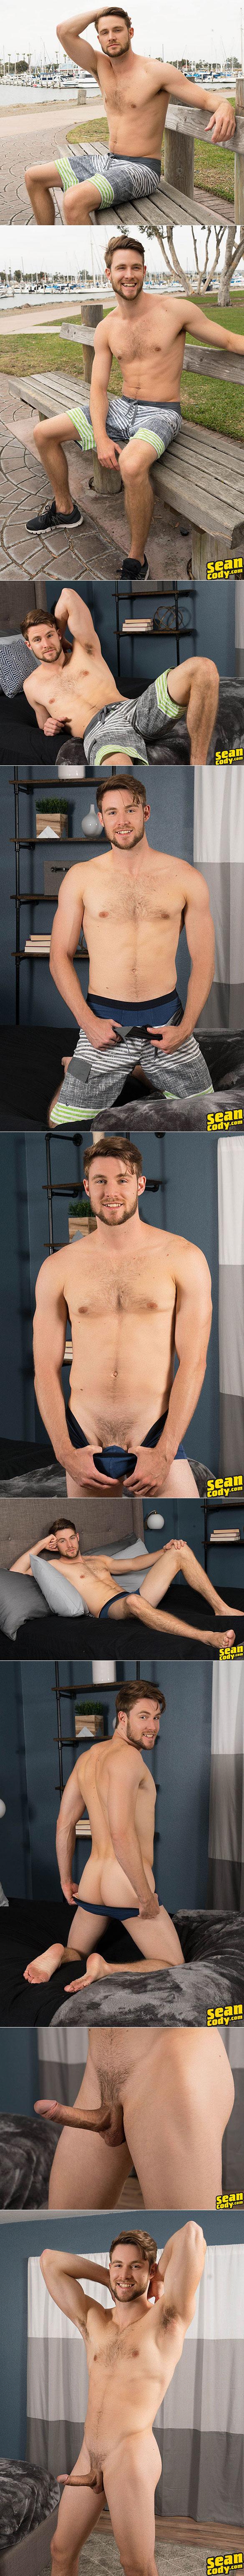 Sean Cody: Kody rubs one out